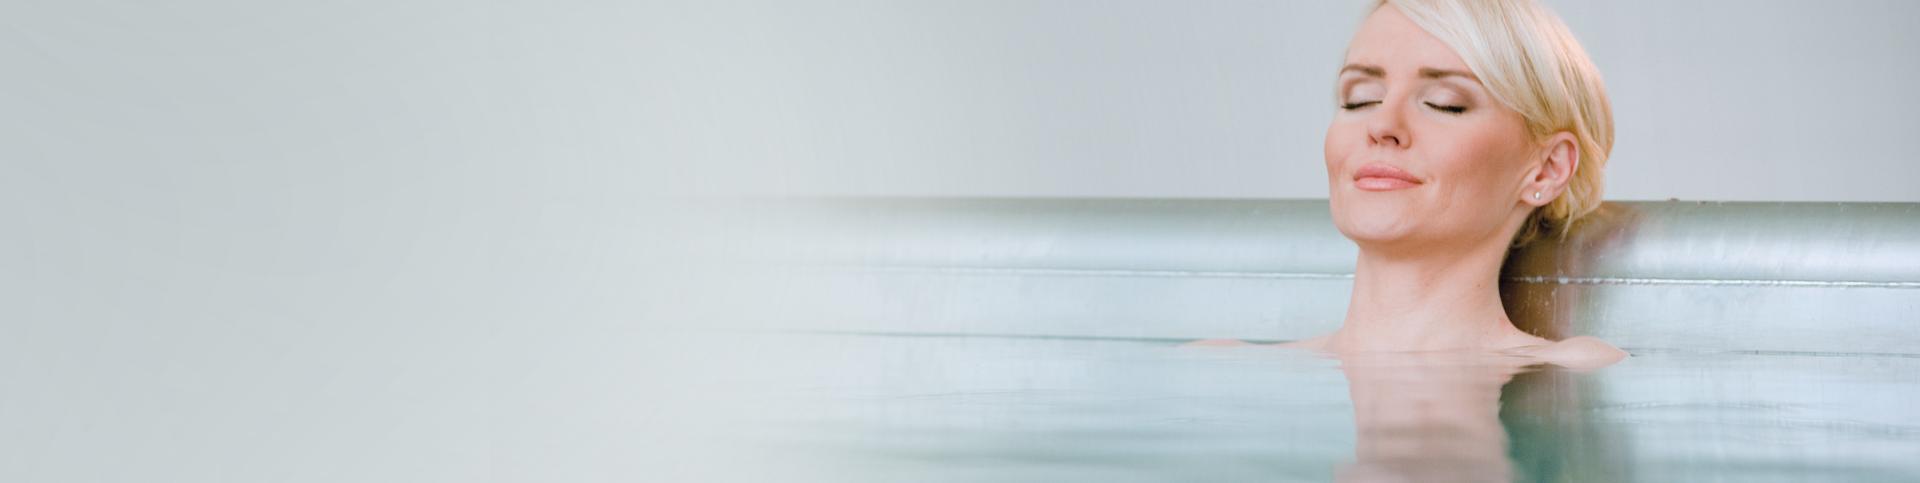 Akciový liečebný pobyt - Kúpele Dudince